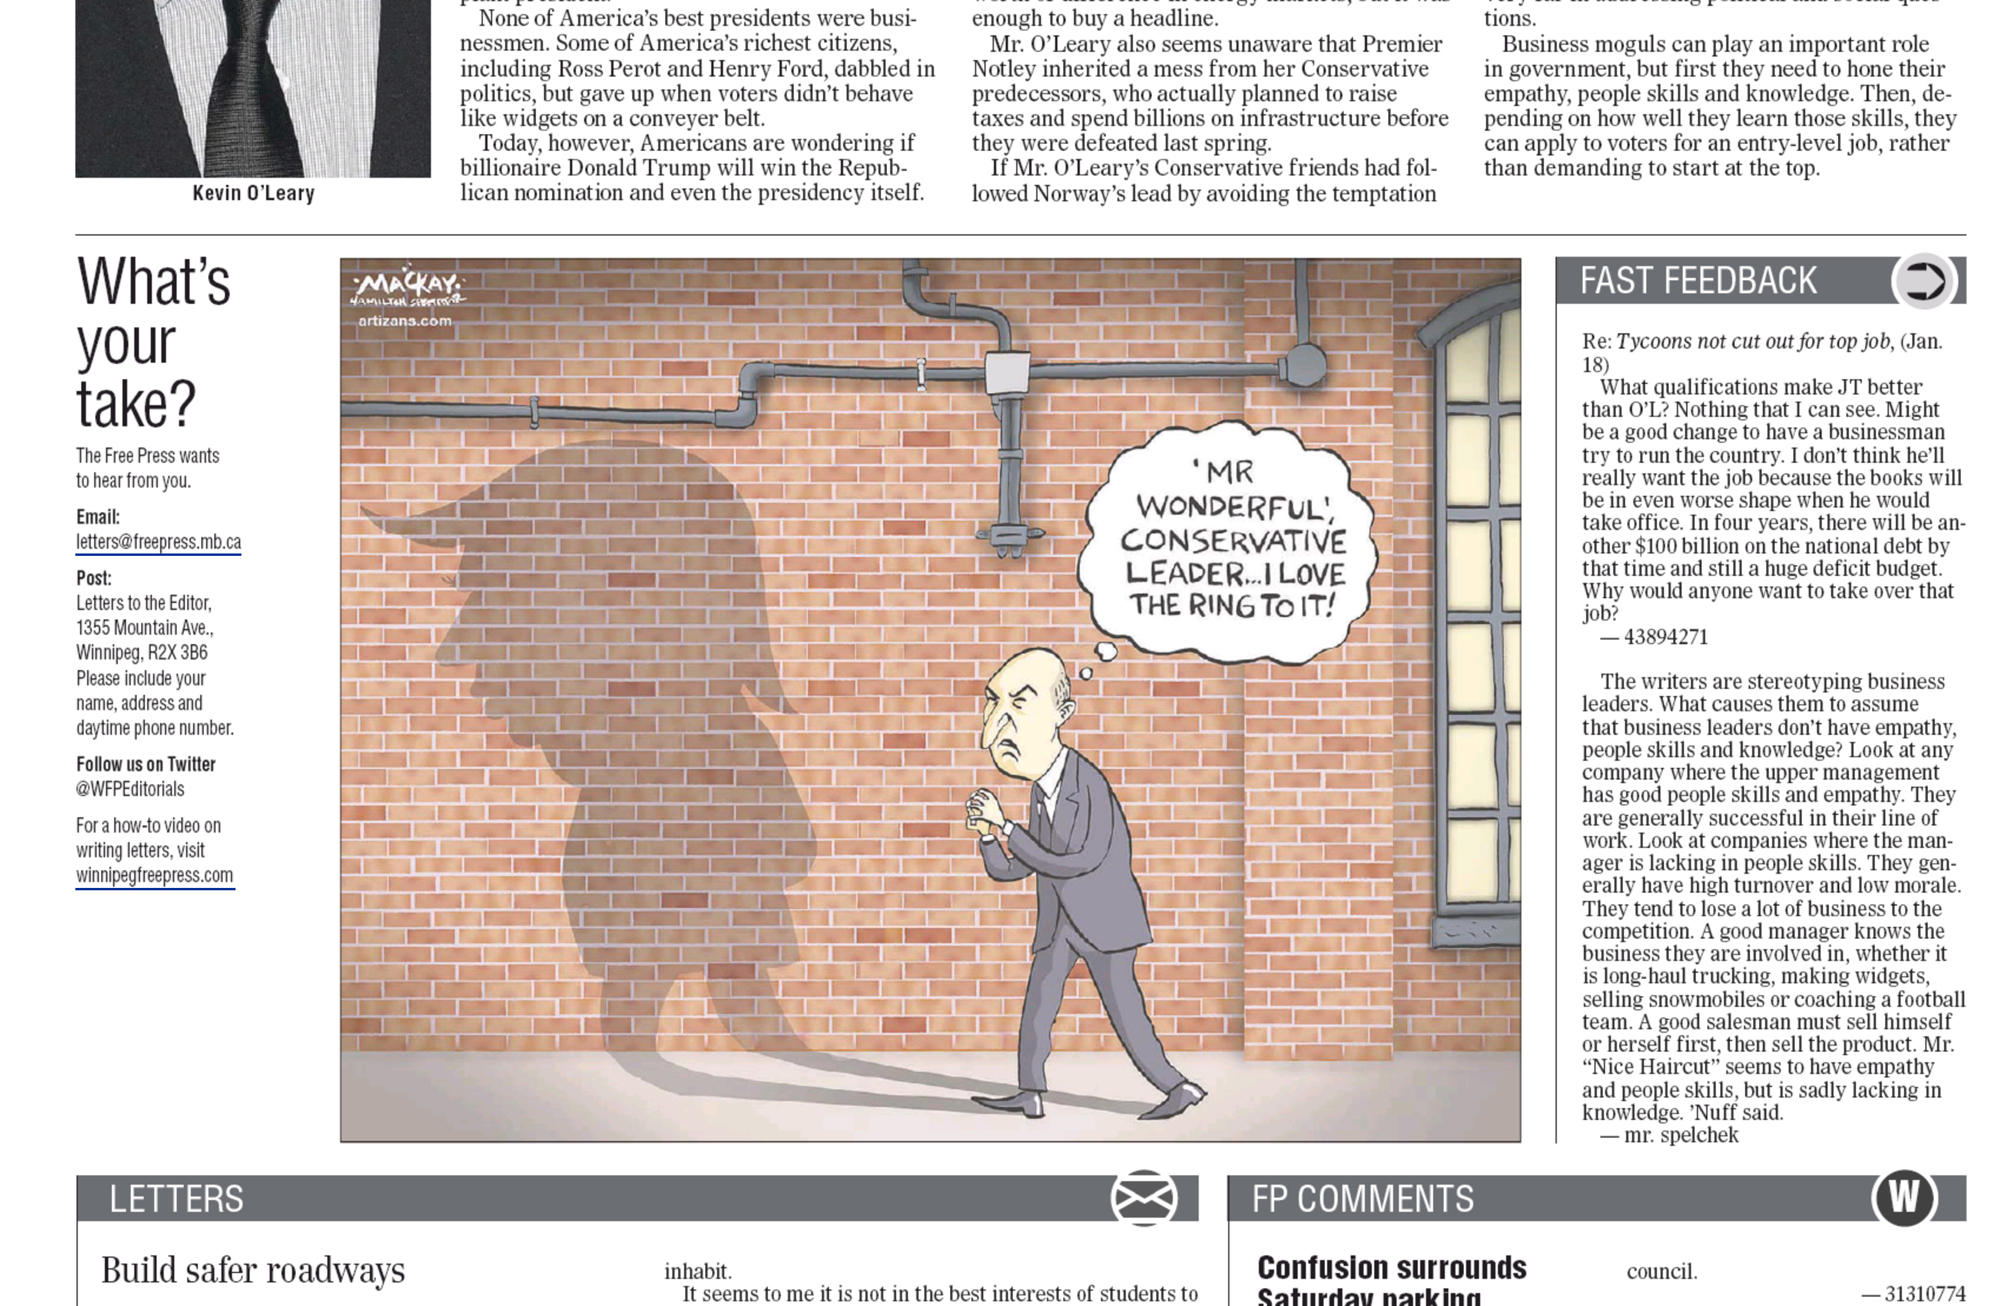 Published in the Winnipeg Free Press, January 18, 2016